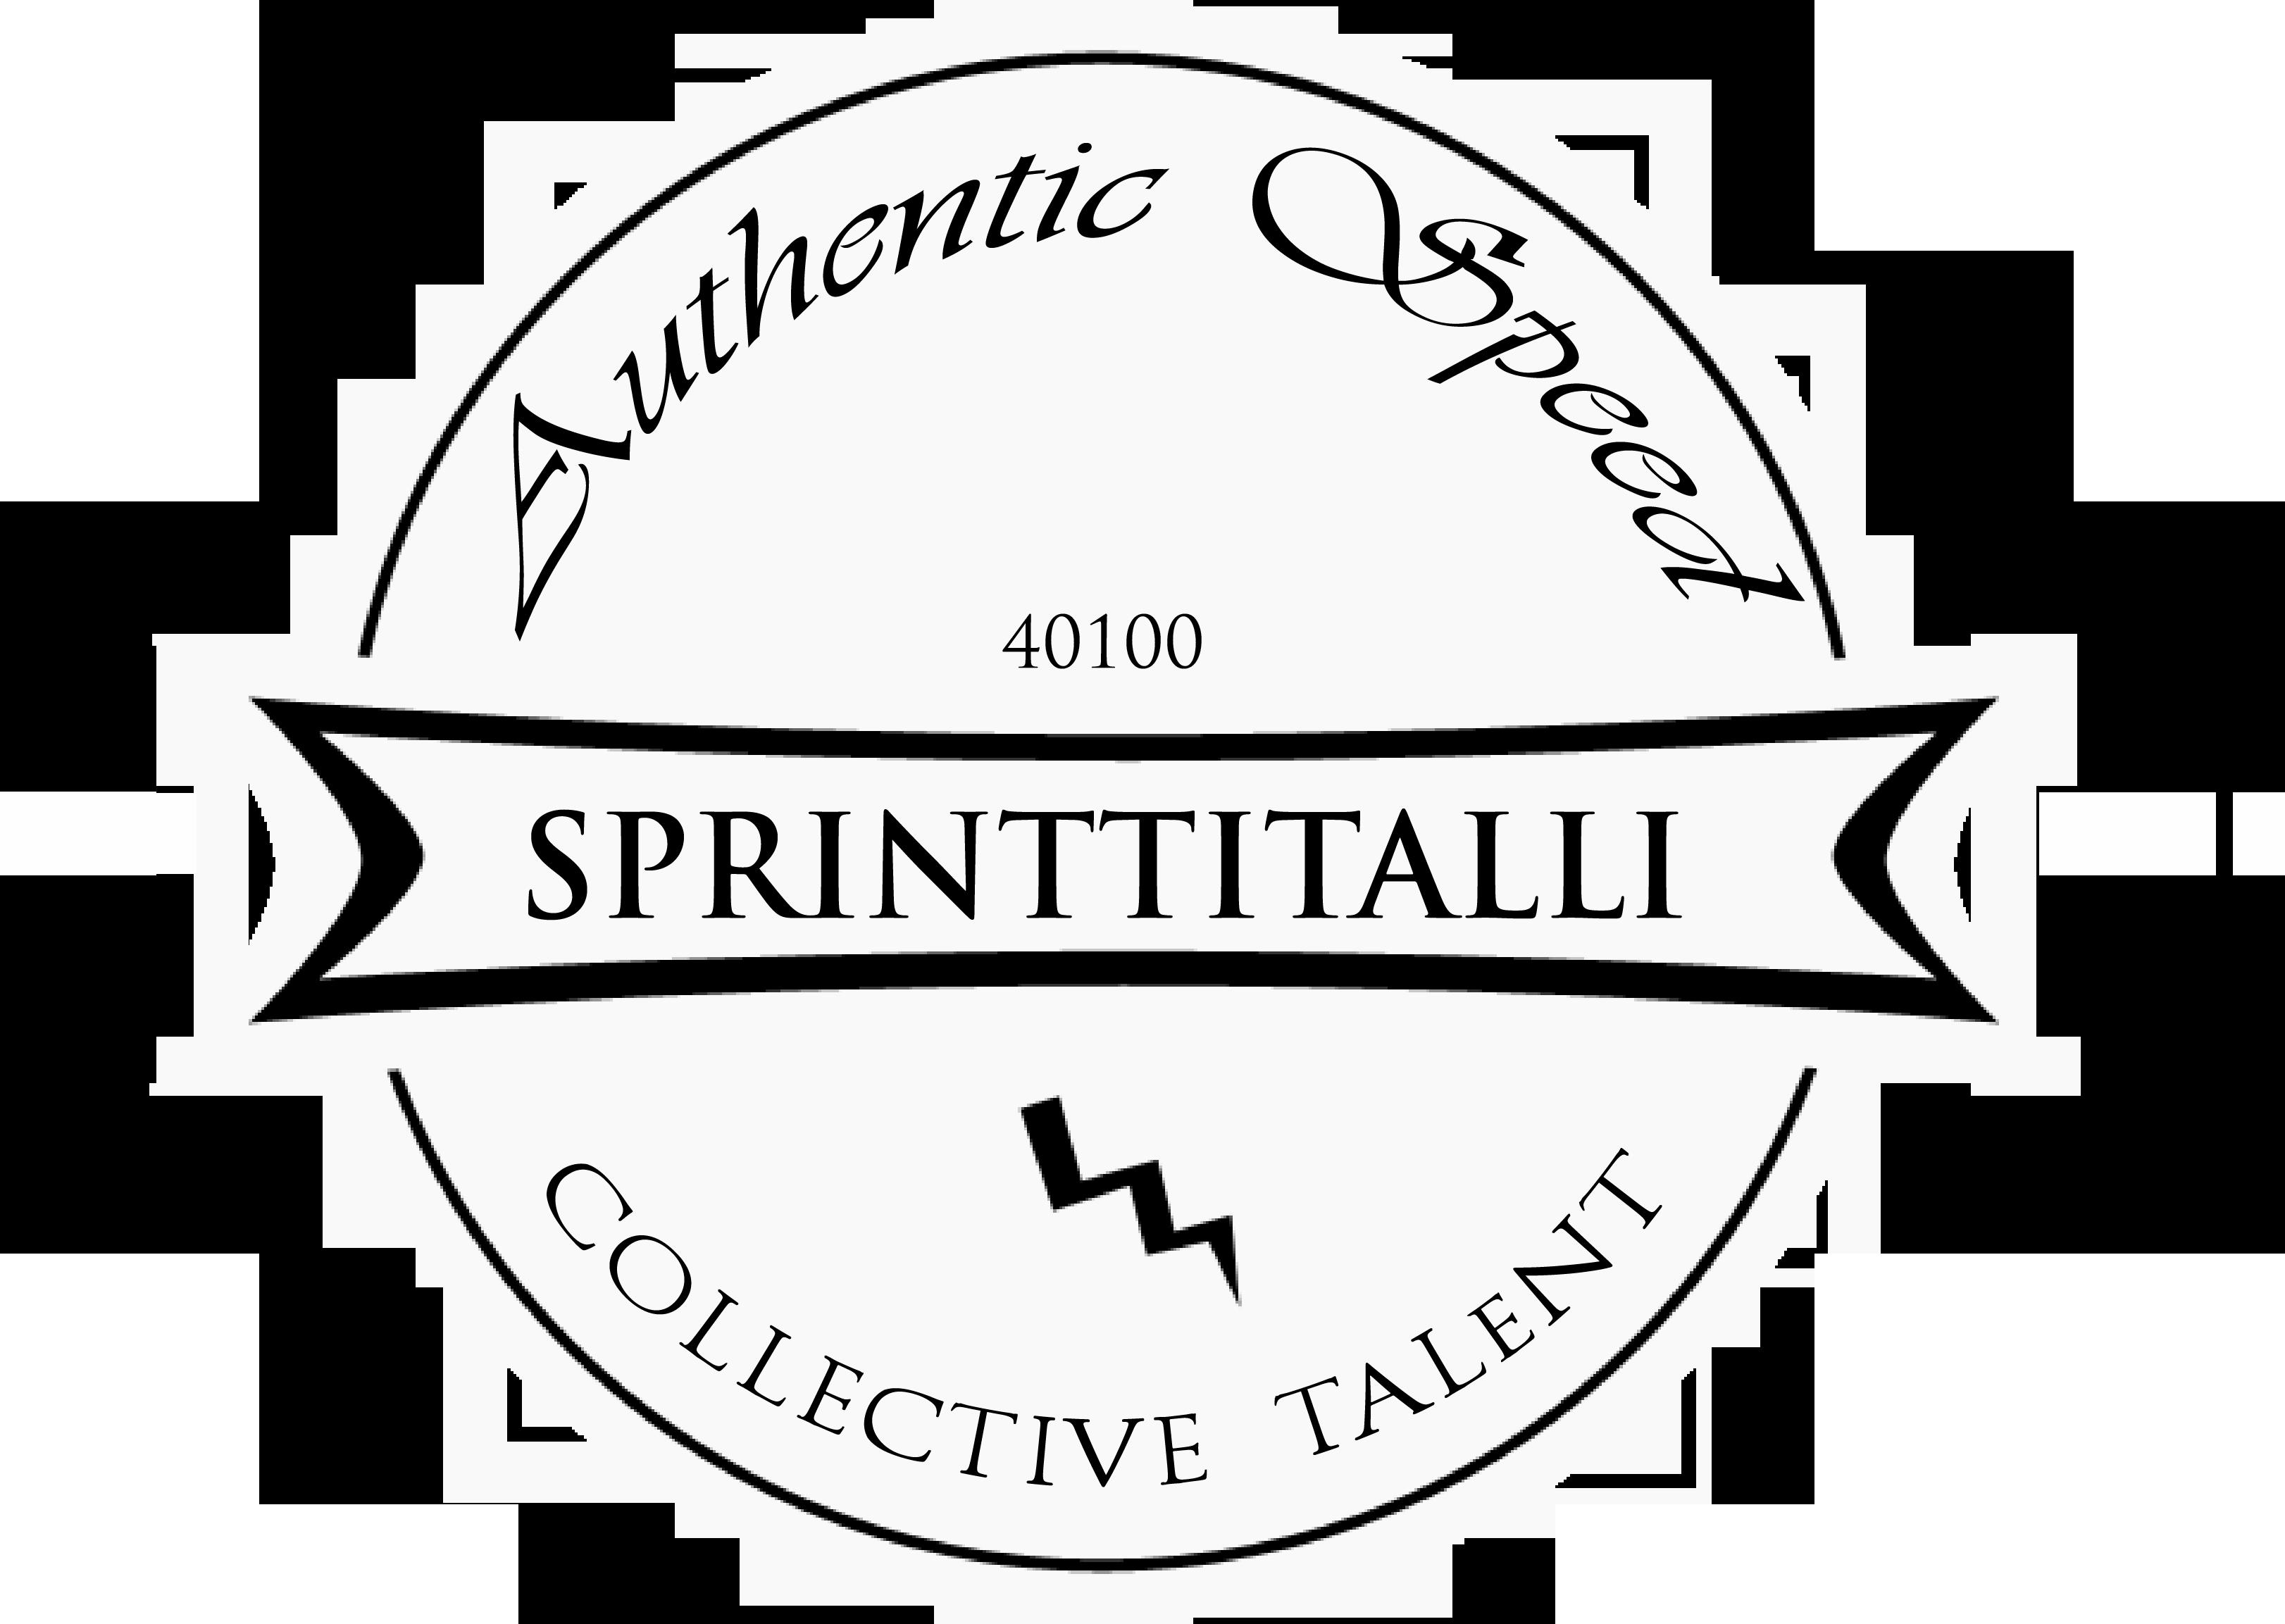 Sprinttitalli